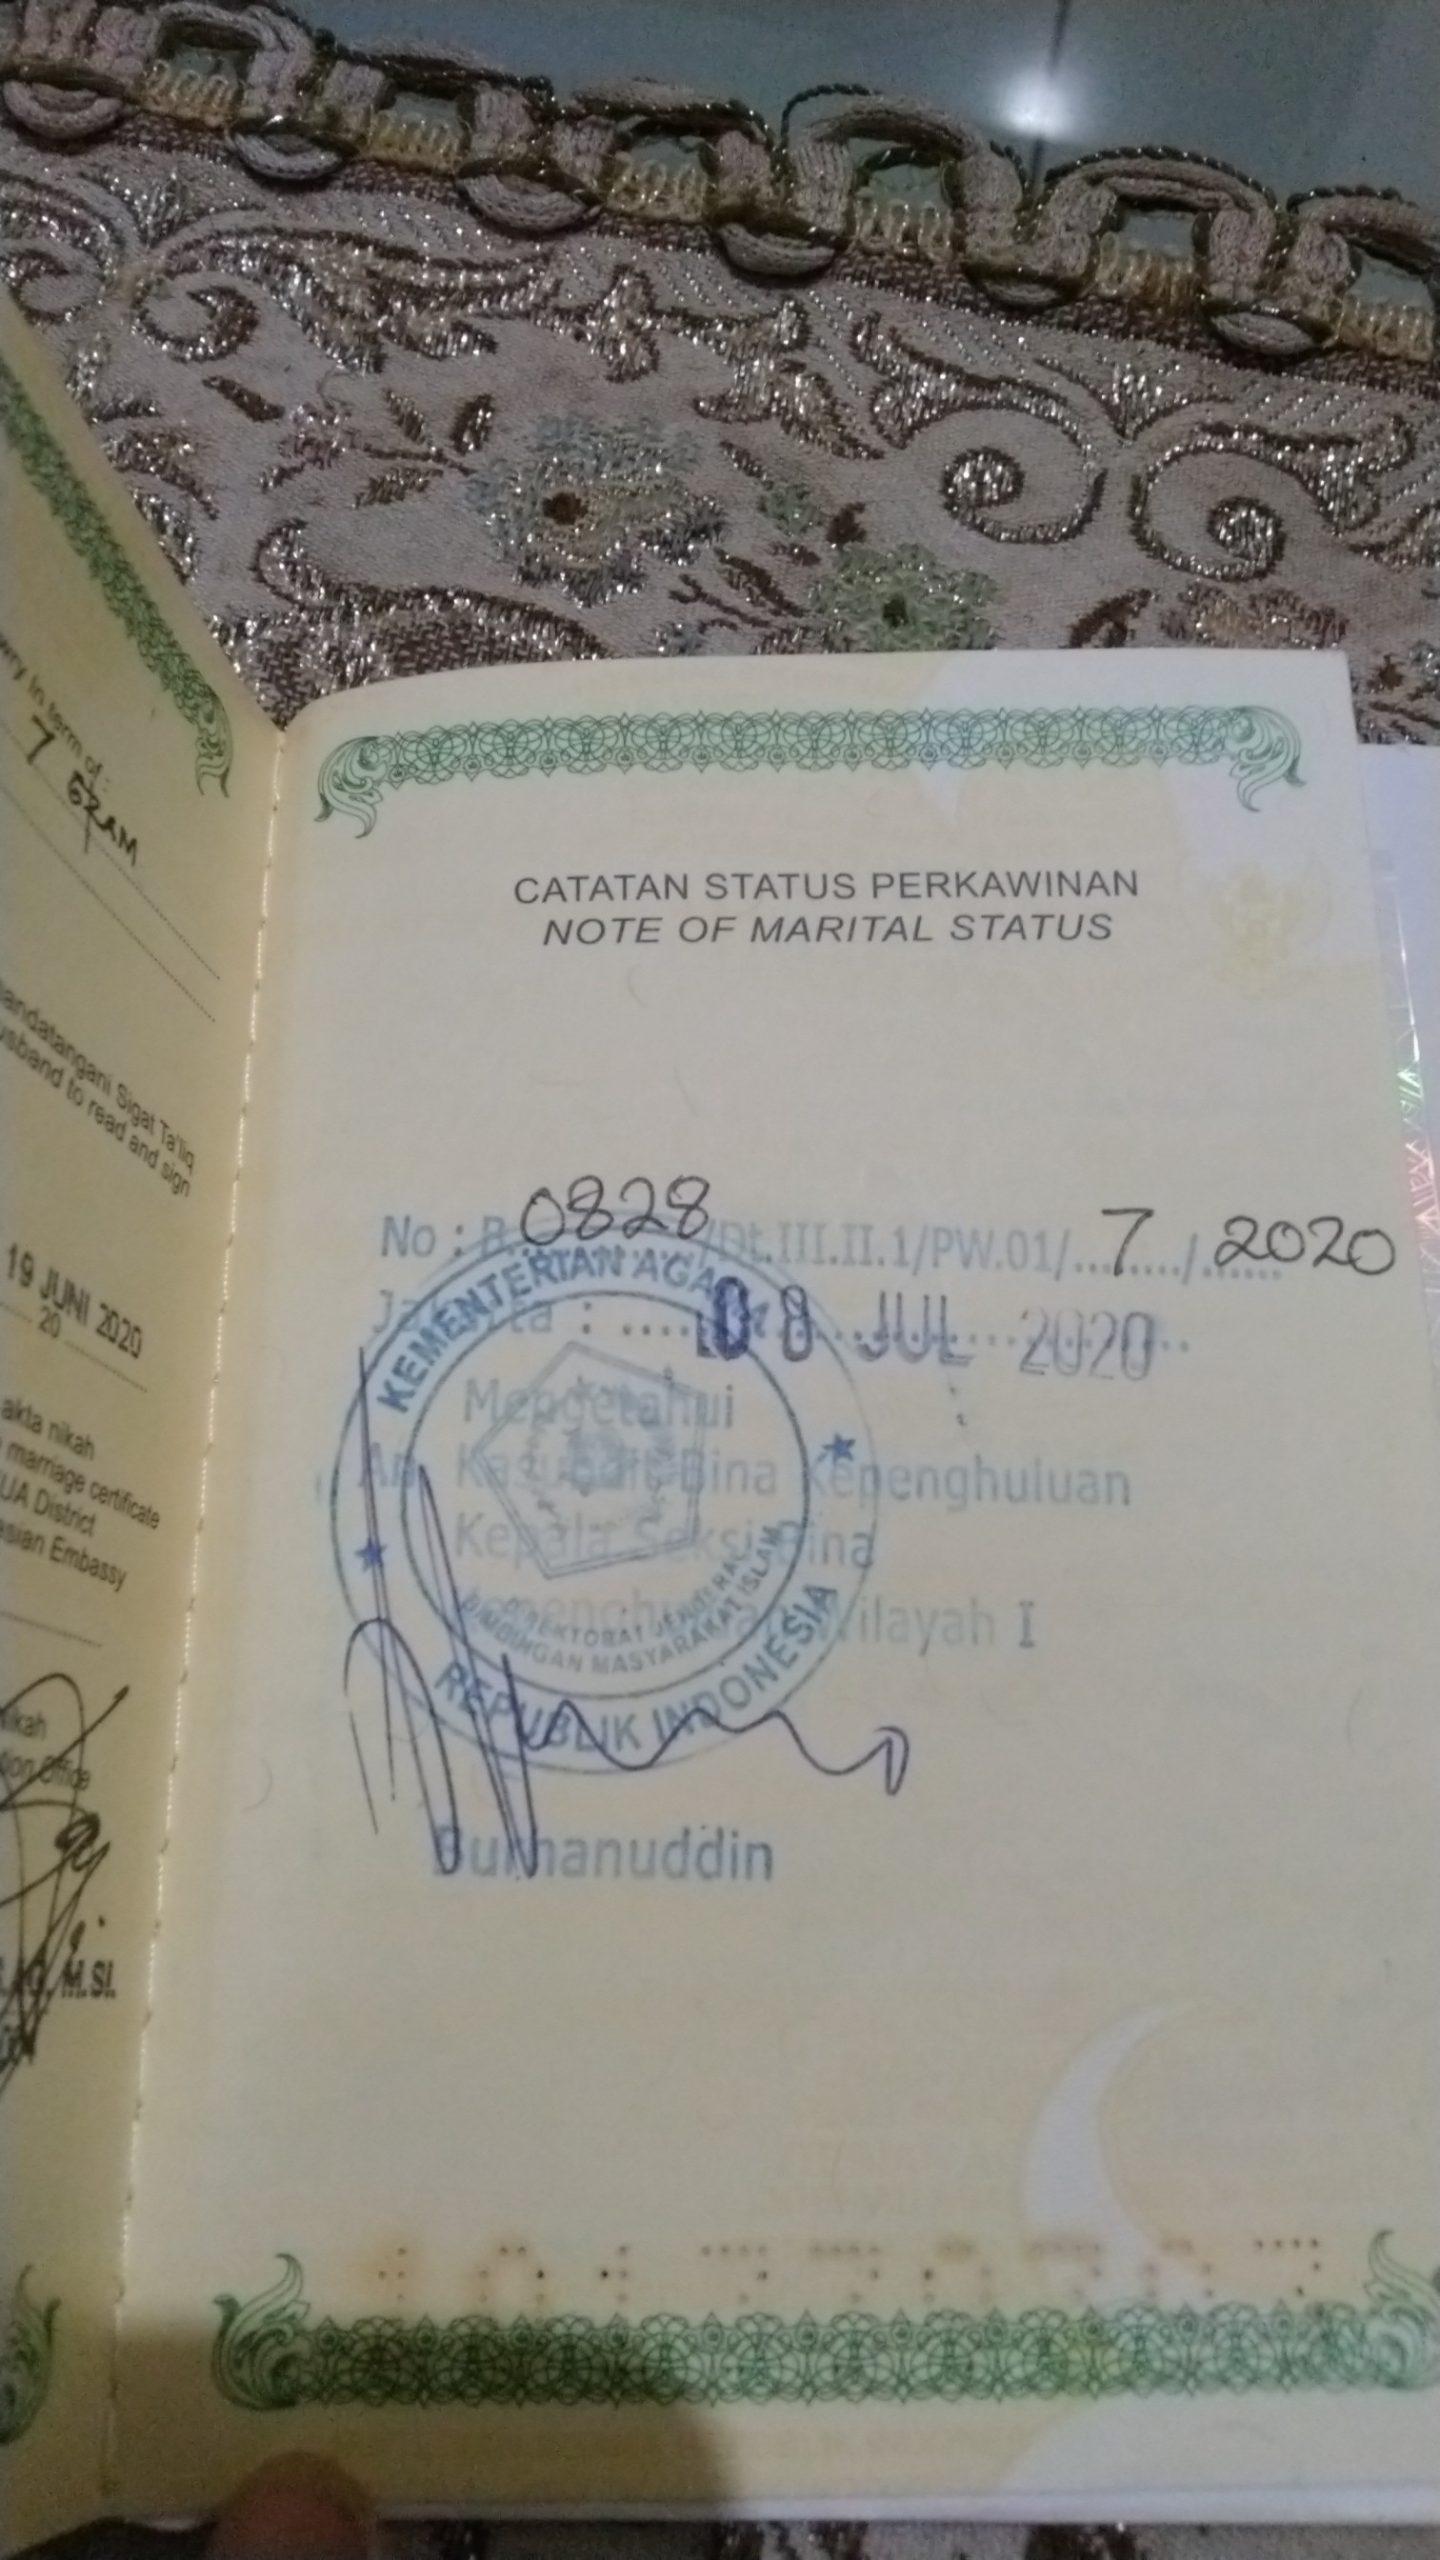 Layanan Legalisir di Kedutaan Asing Selama Pandemi Covid19